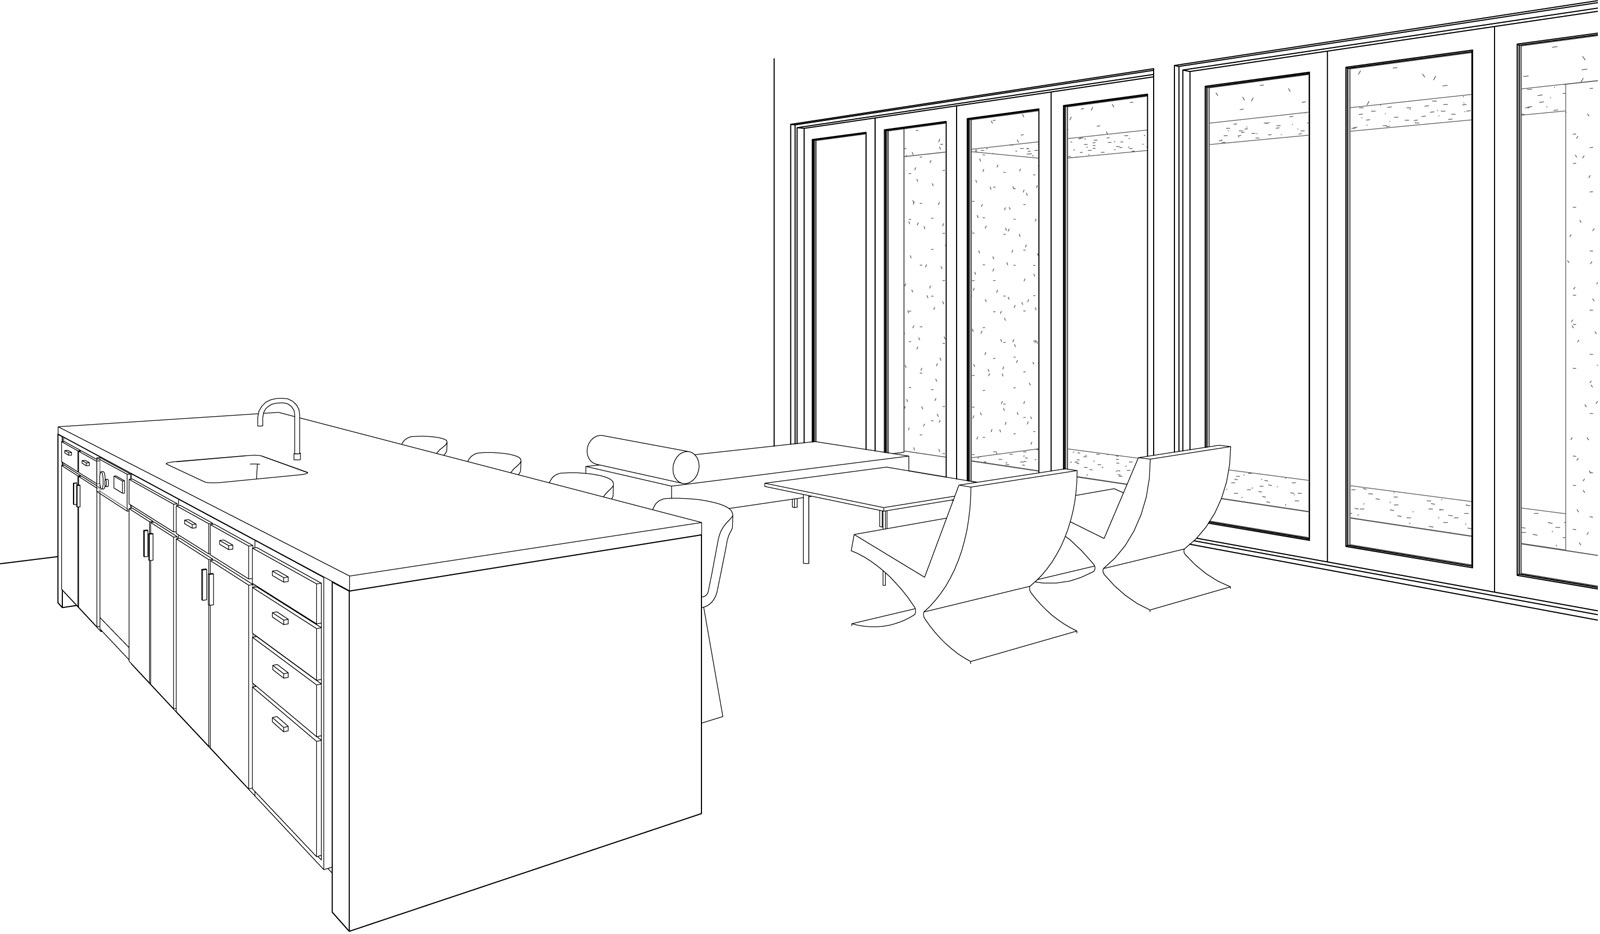 One-Seneca-Tower - Interior Perspective